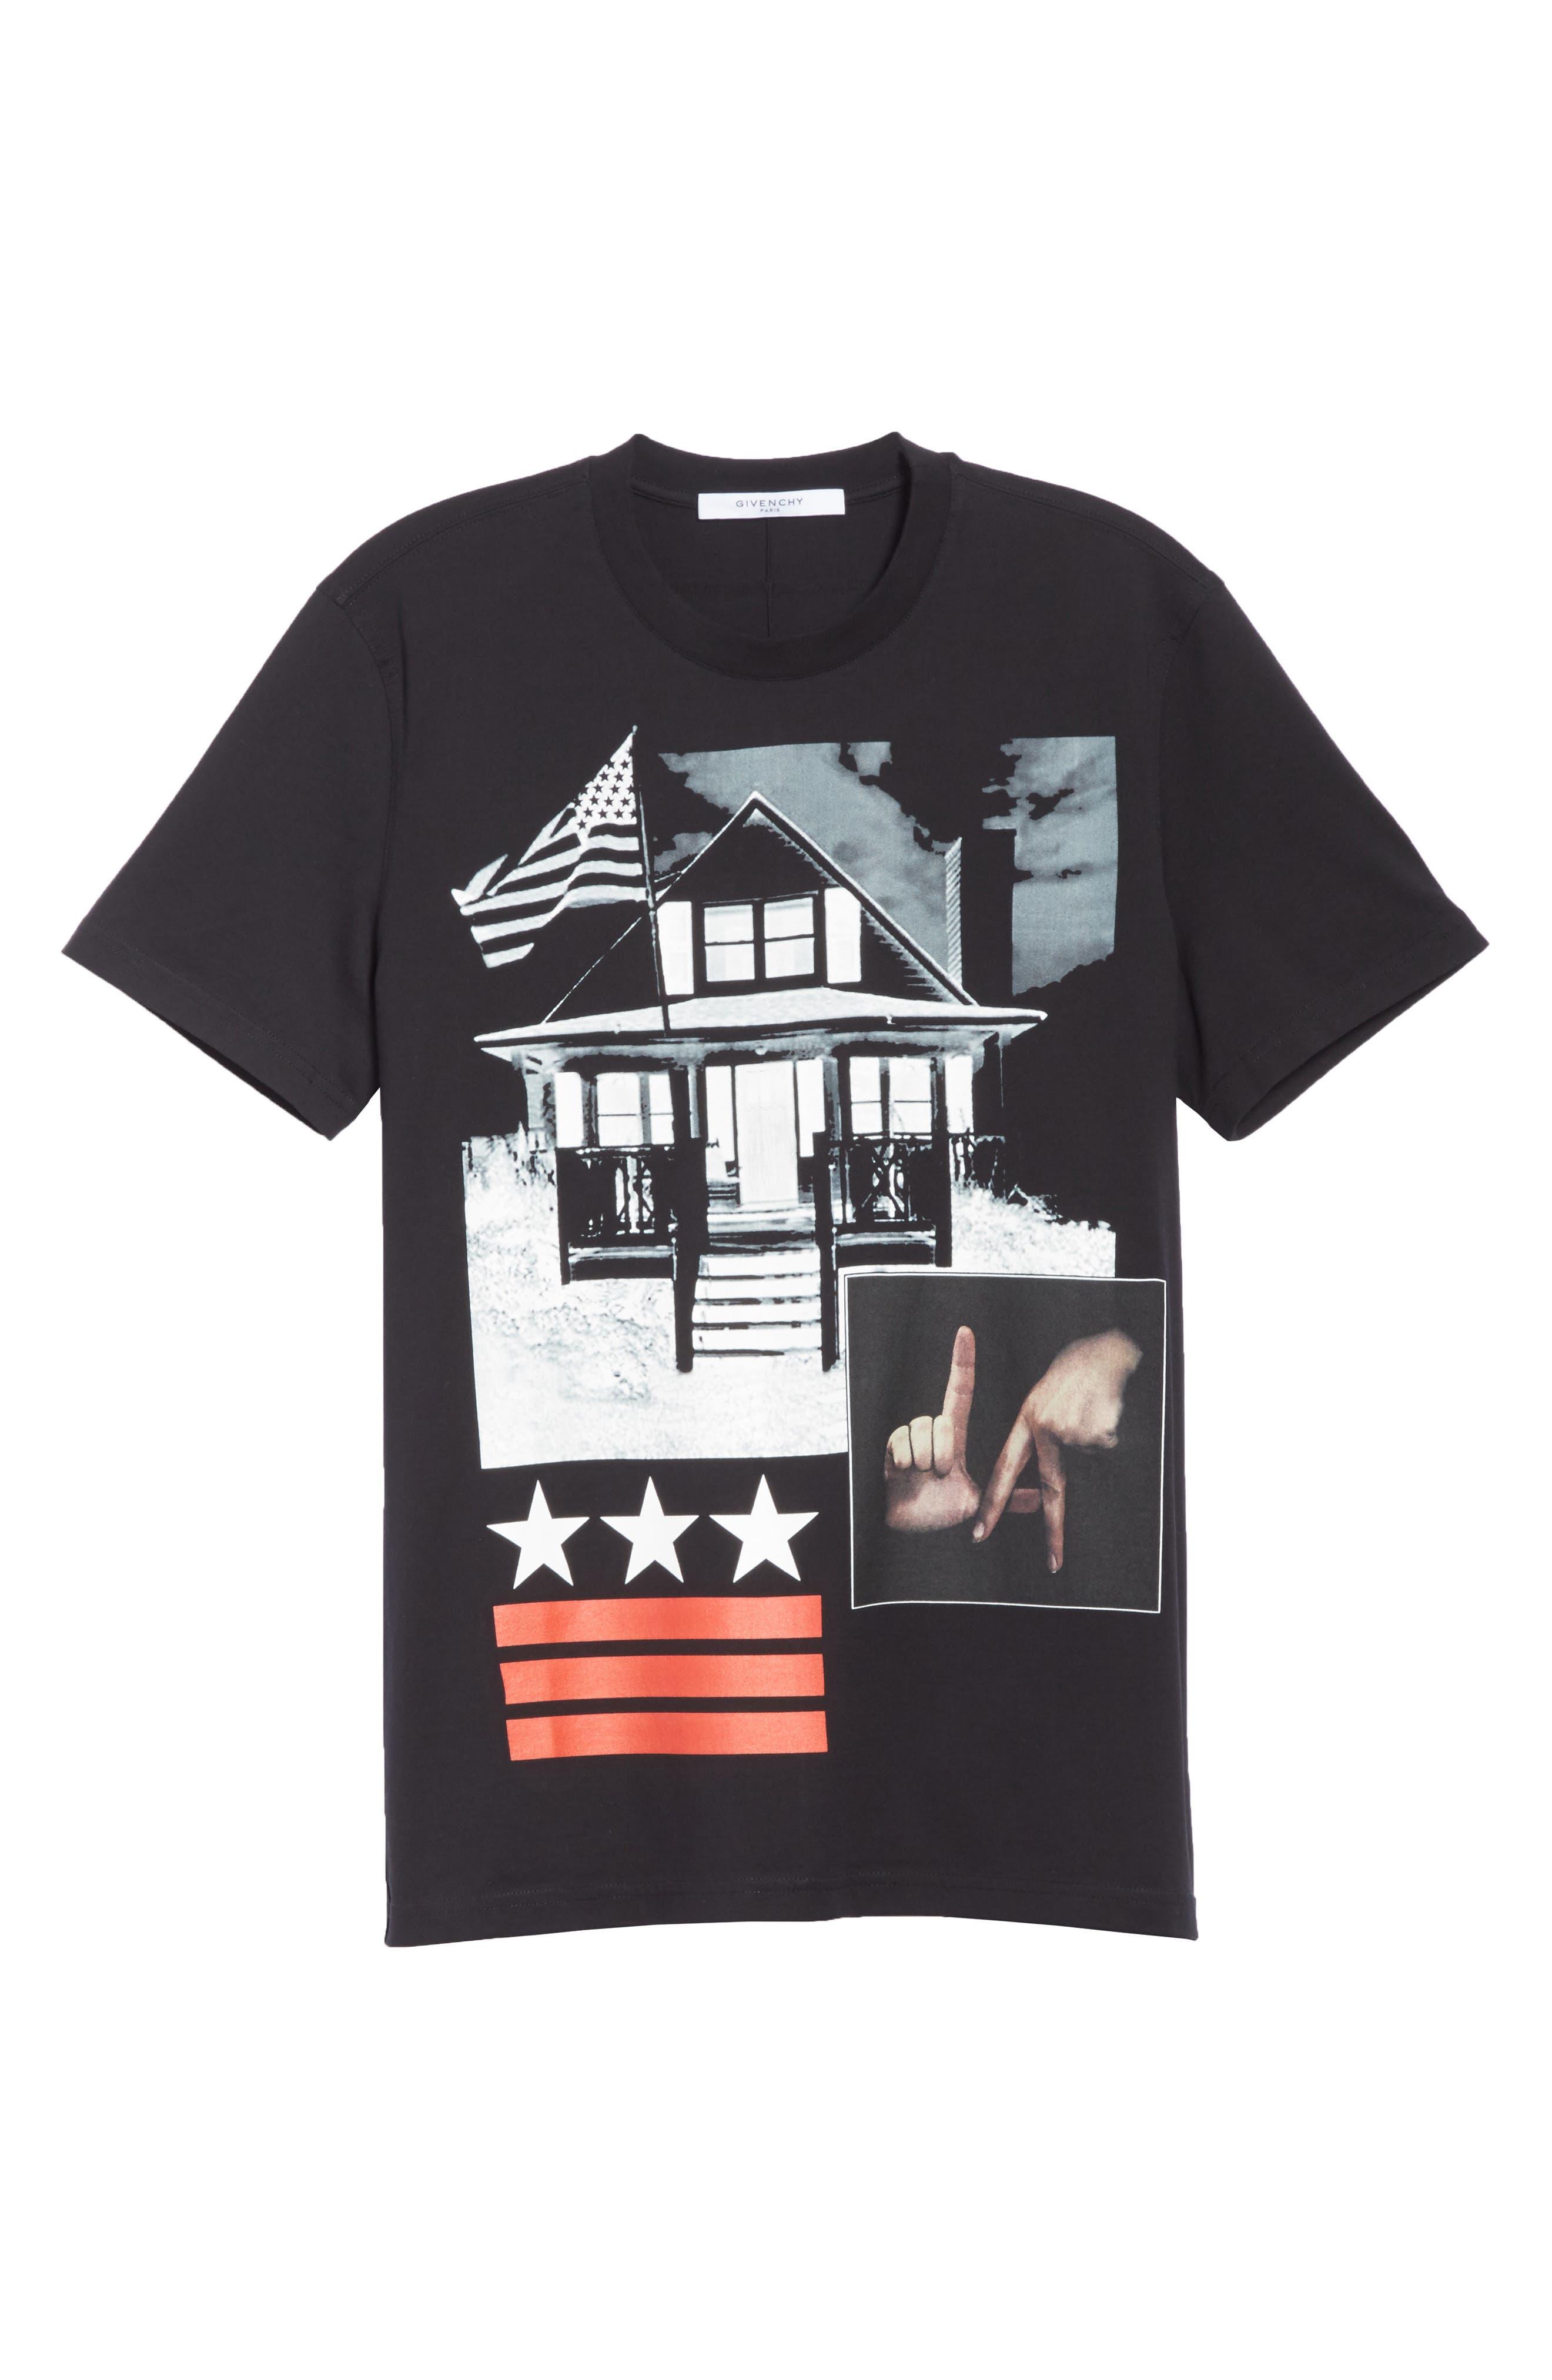 LA House Graphic T-Shirt,                             Alternate thumbnail 6, color,                             Black